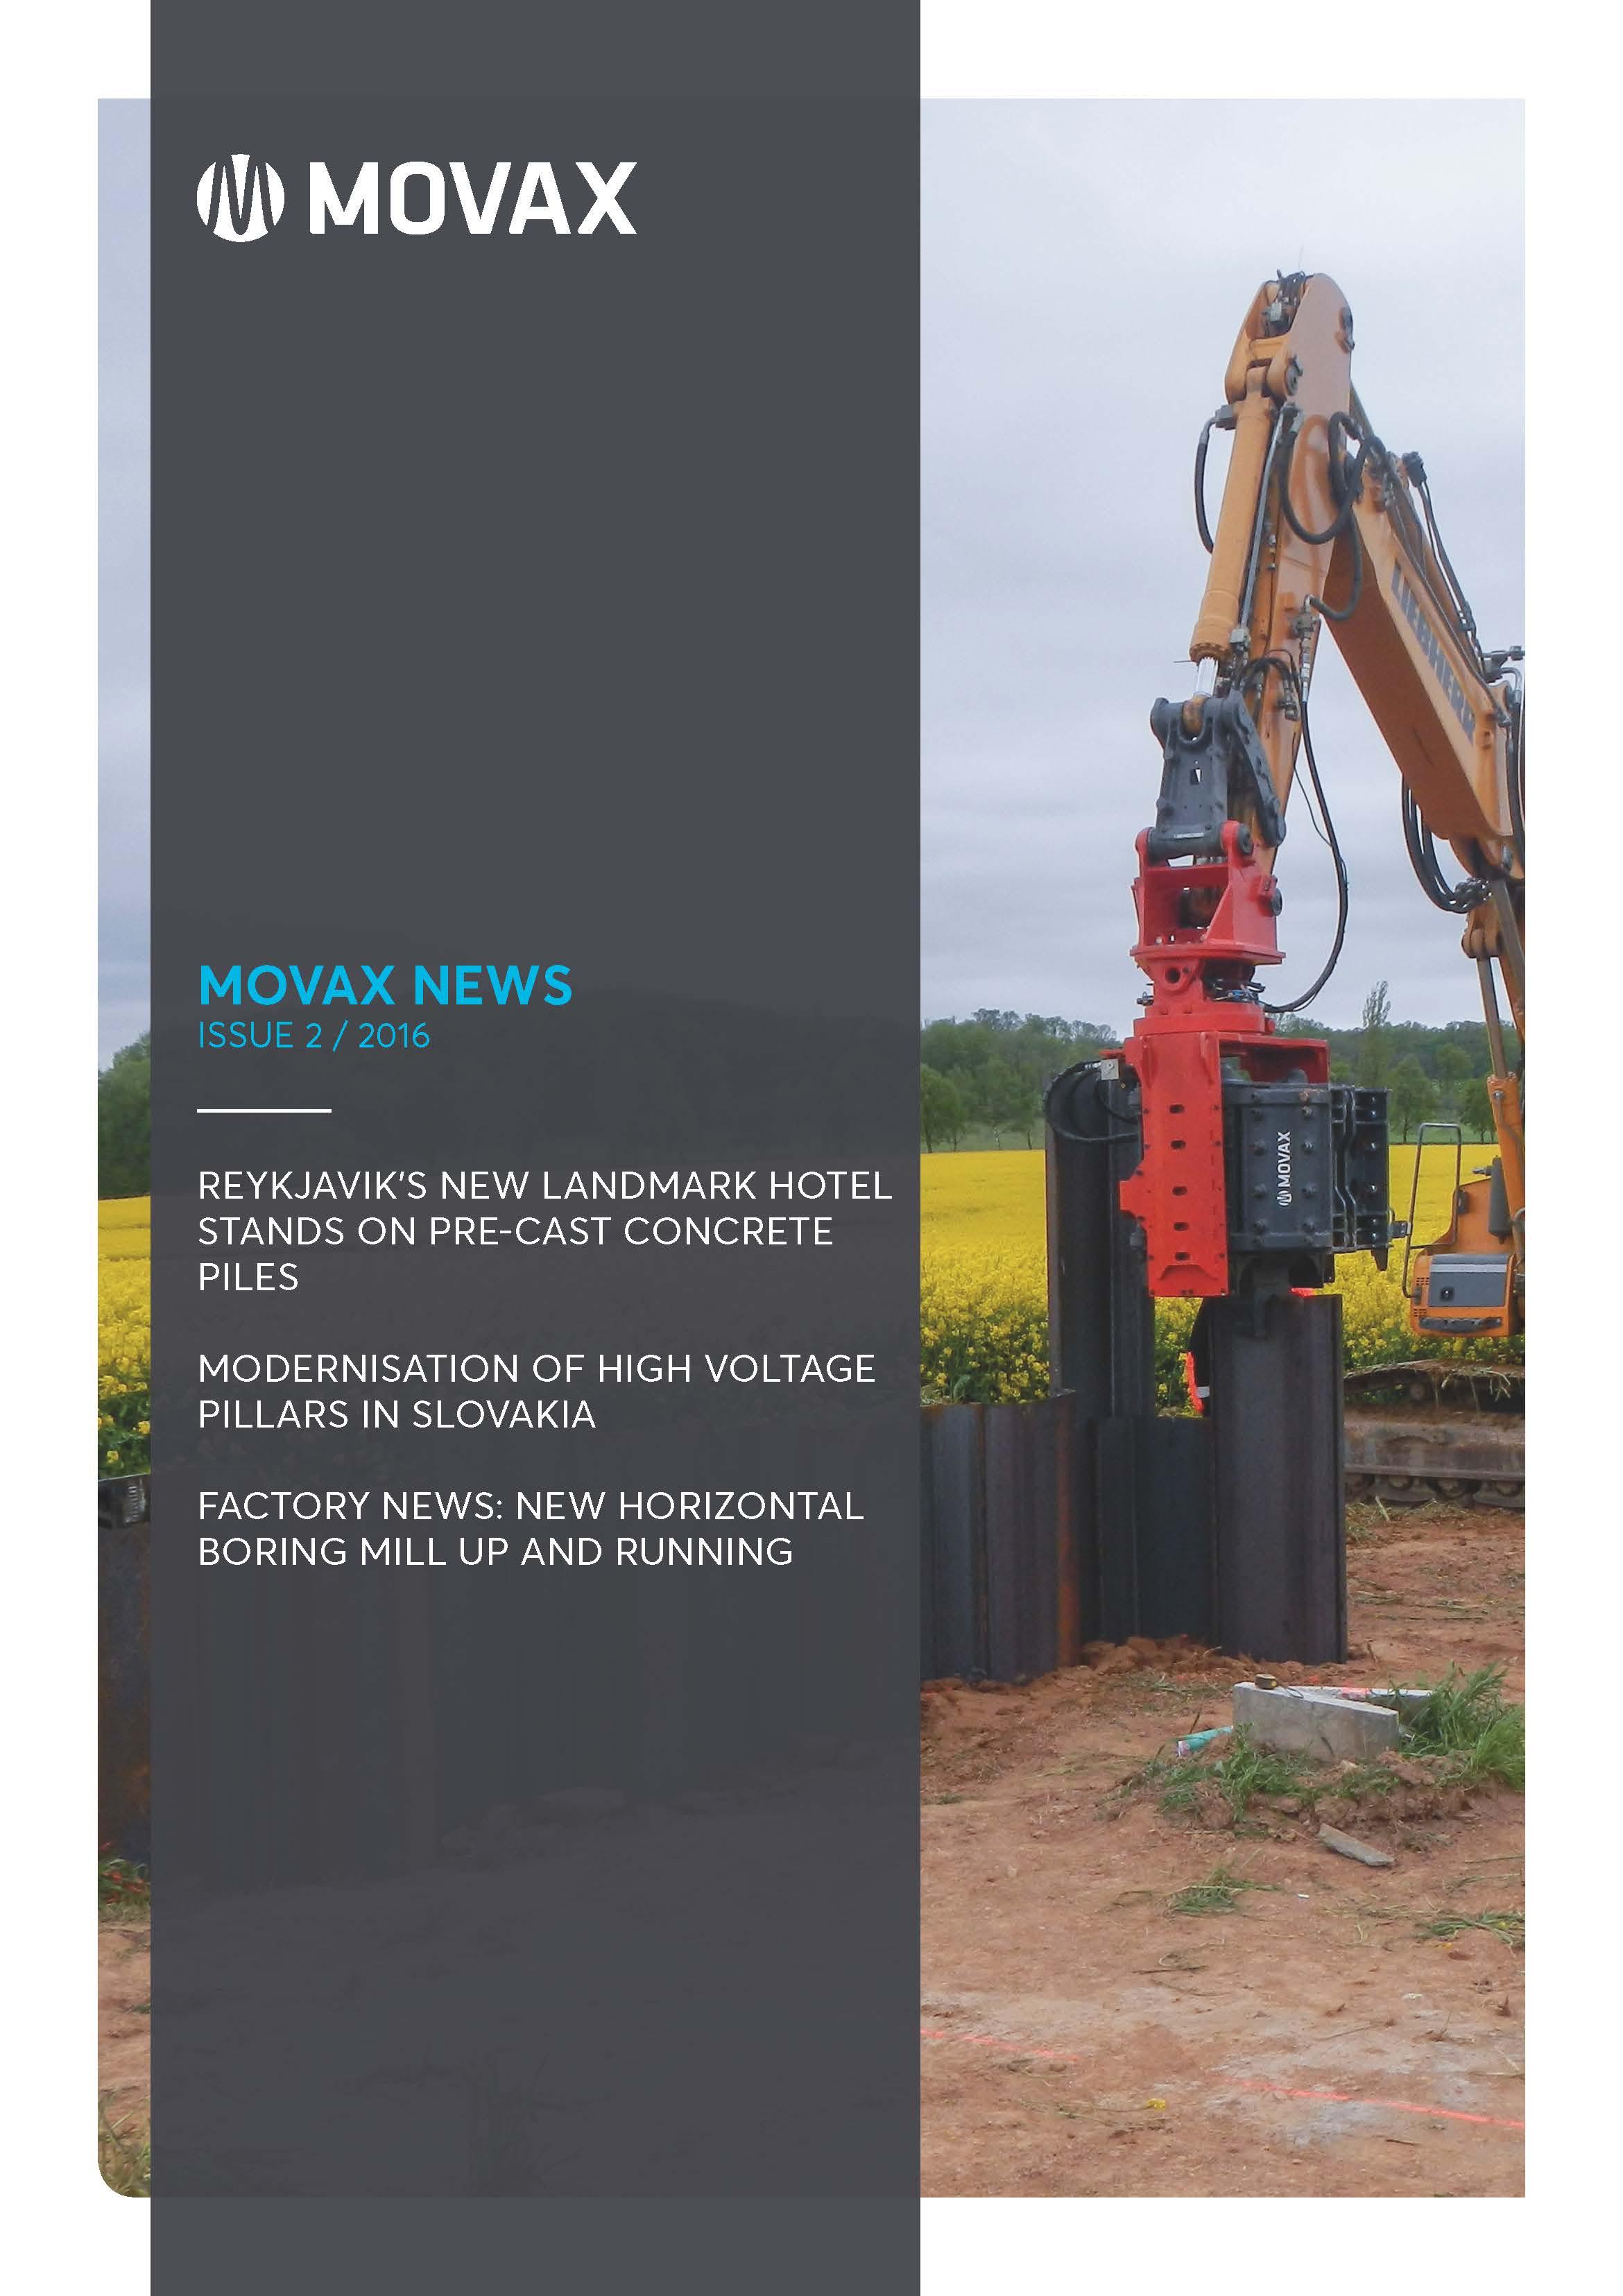 Movax News 02/2016